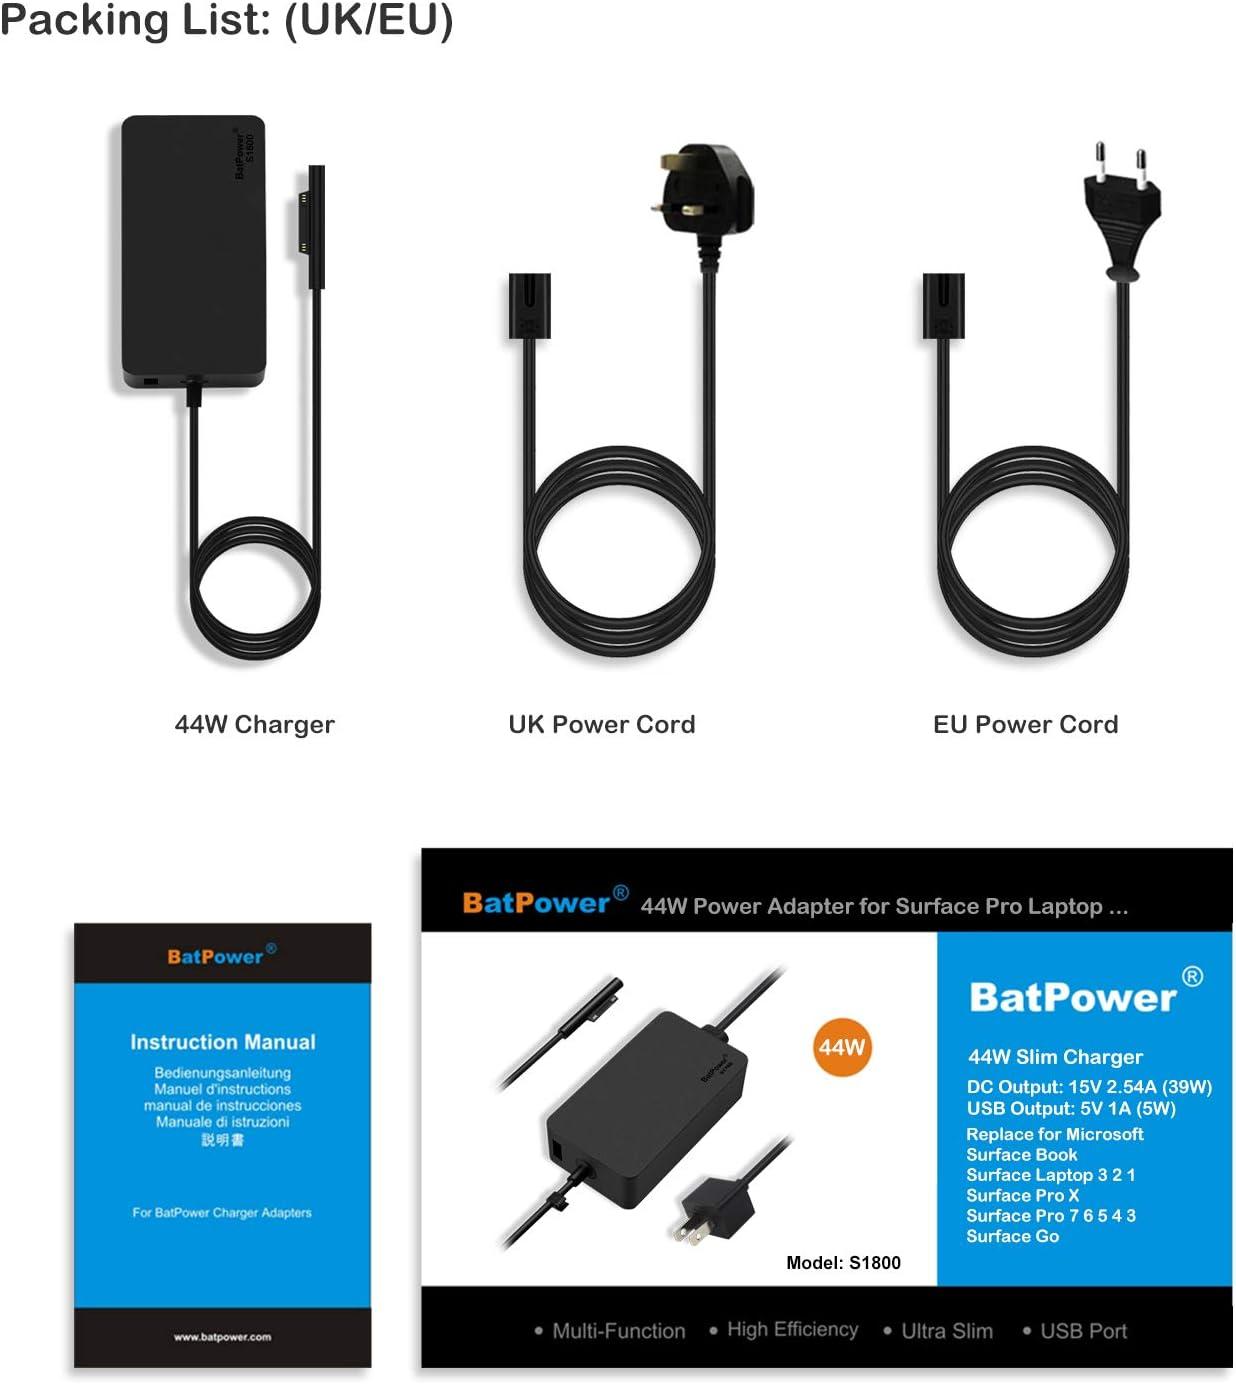 BatPower 15V 2.58A 44W Ladeger/ät Netzteil f/ür Surface Laptop Surface Pro 6 5 4 3 und Surface Go Book Tablet Microsoft 1706 1800 1735 1736 Charger Adapter ladekabel mit 5V USB Port und EU-Netzkabel